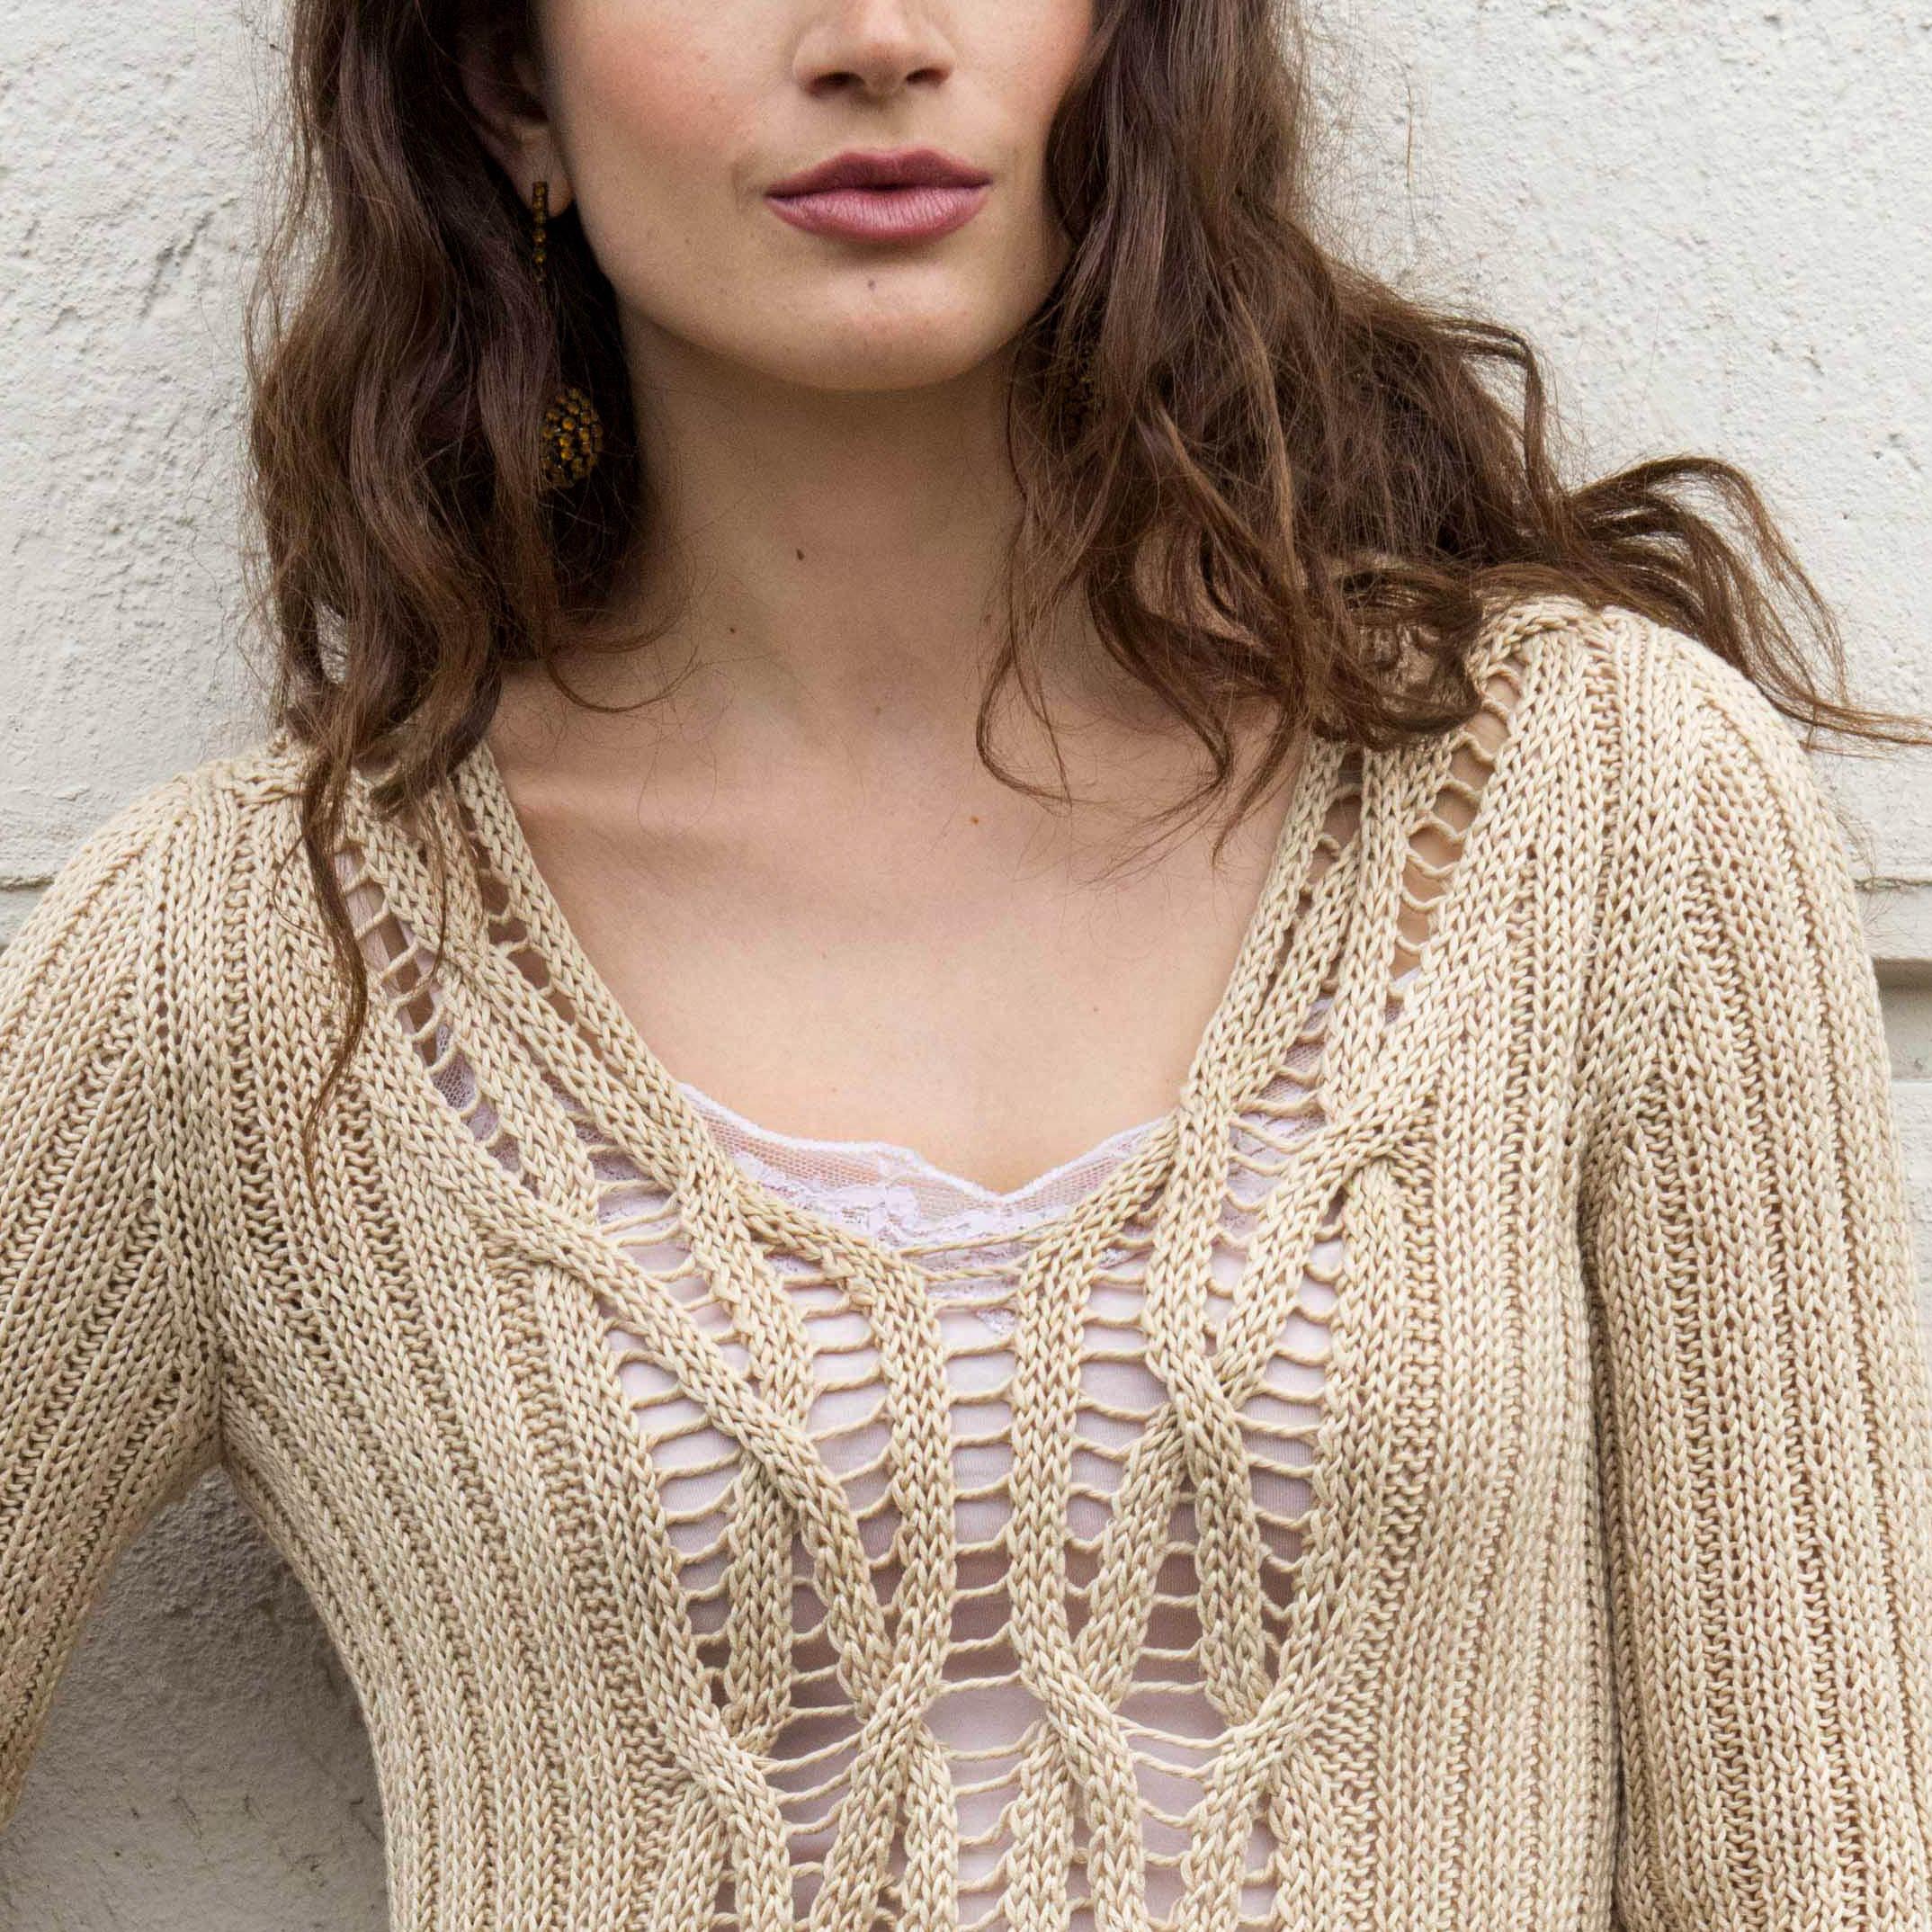 Giuliano&GiusyMarelli_Pull Onde di sabbia_Detail_Knit 'd' Crochet Collection_.jpg